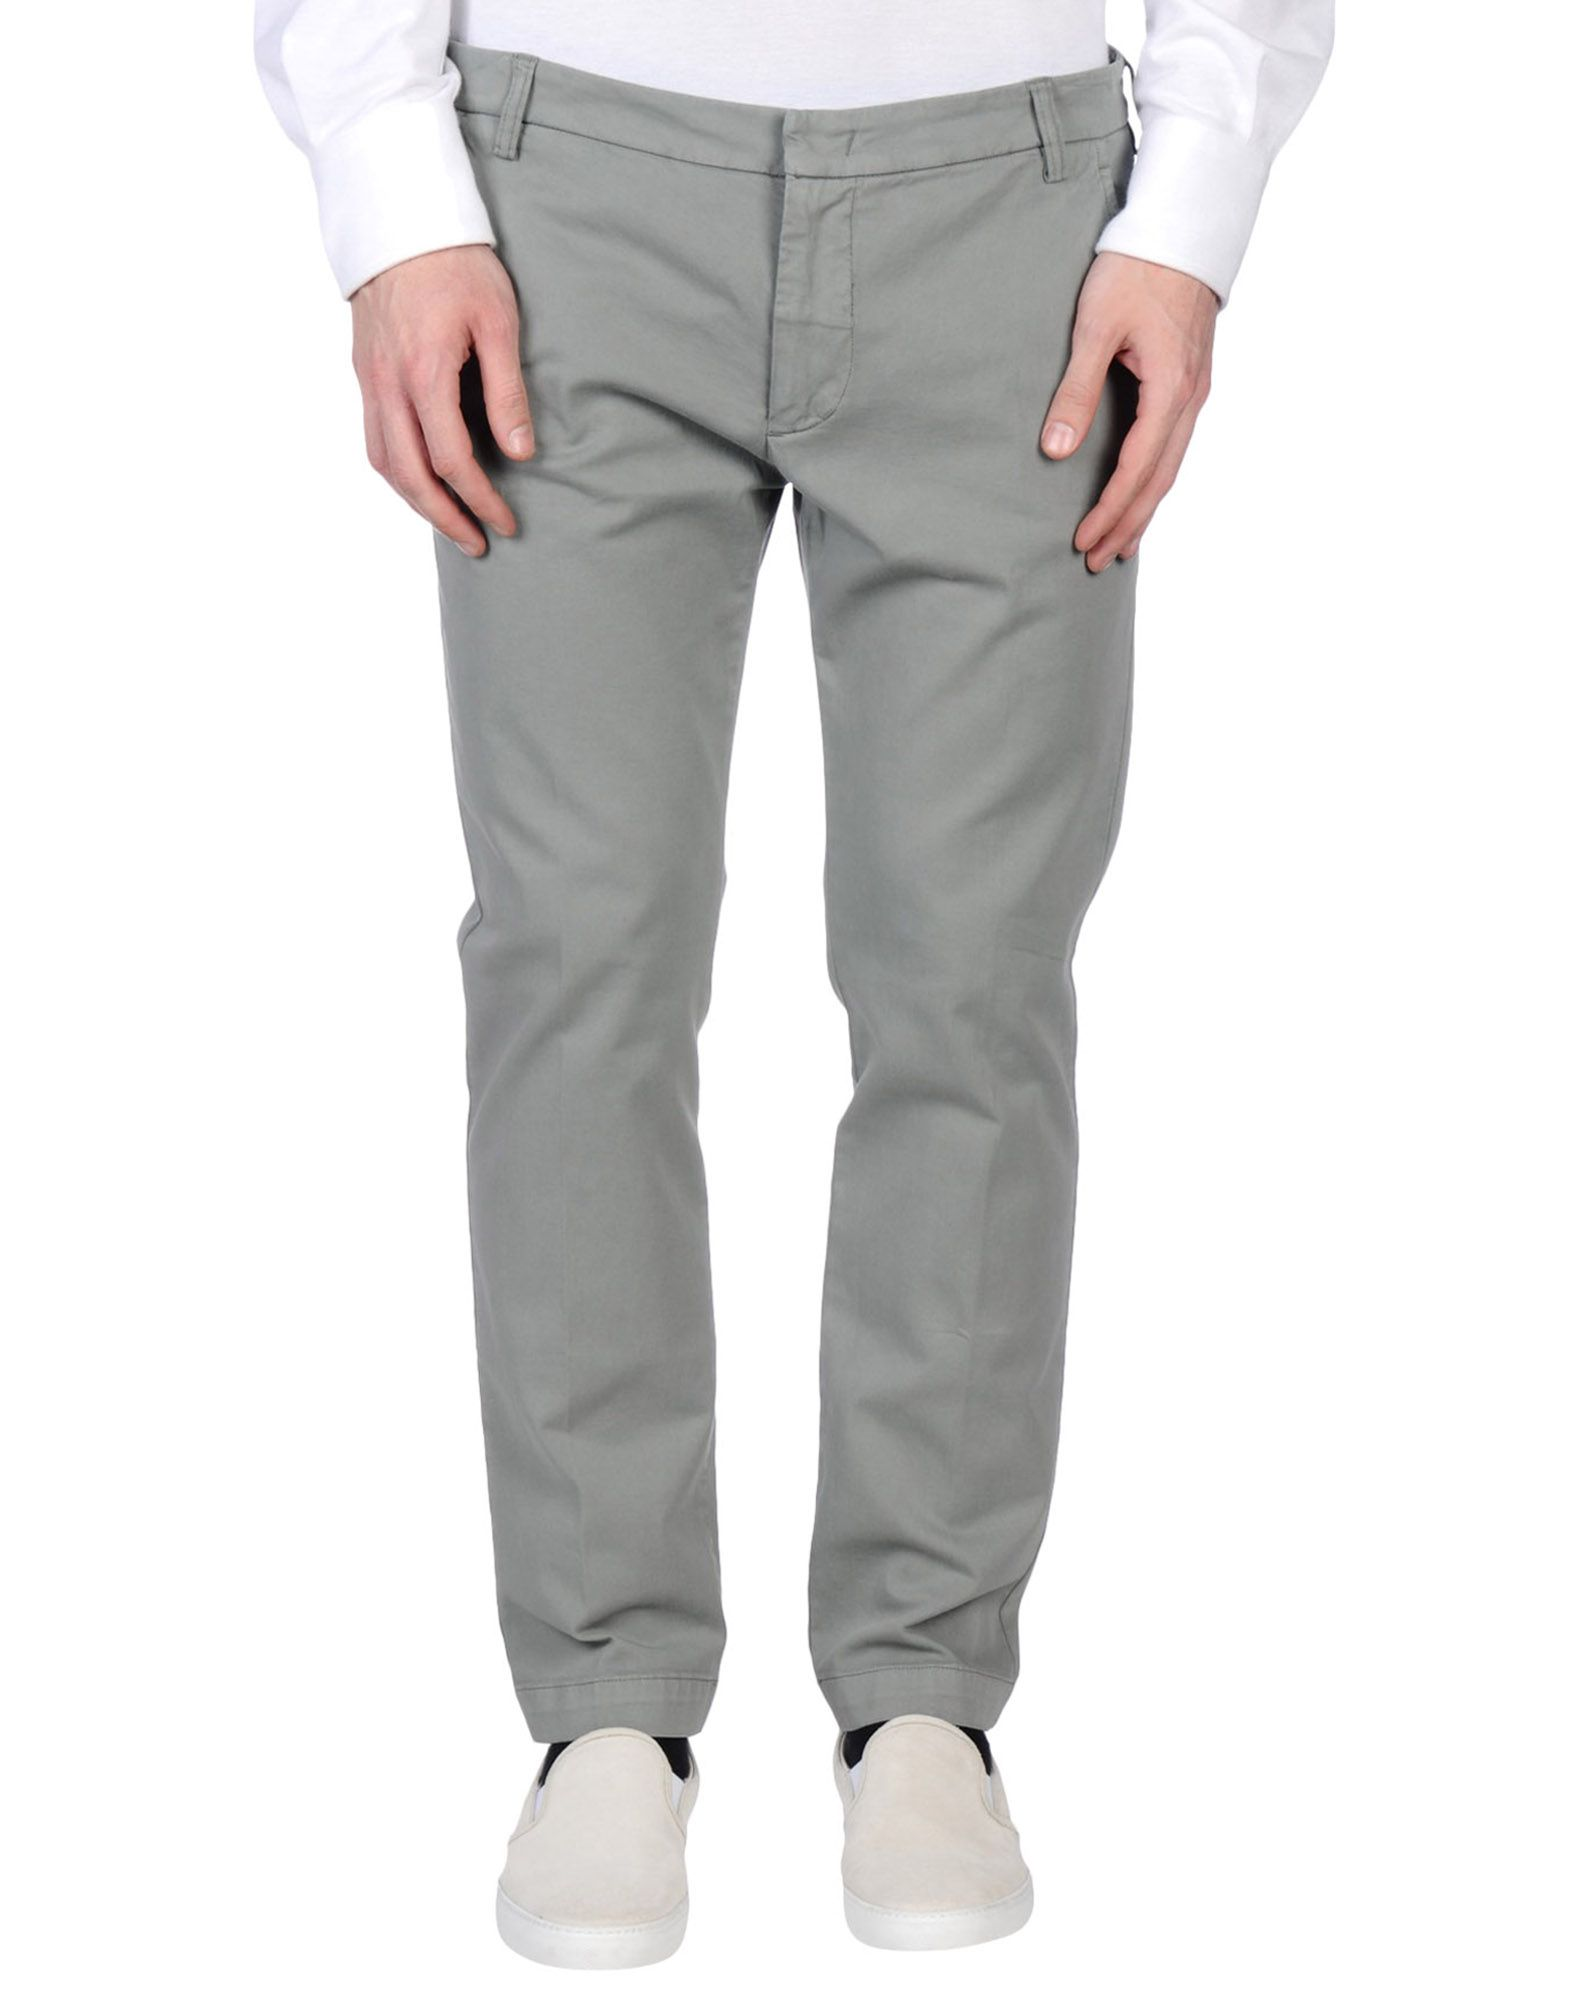 ENTRE AMIS Повседневные брюки amis srbp4